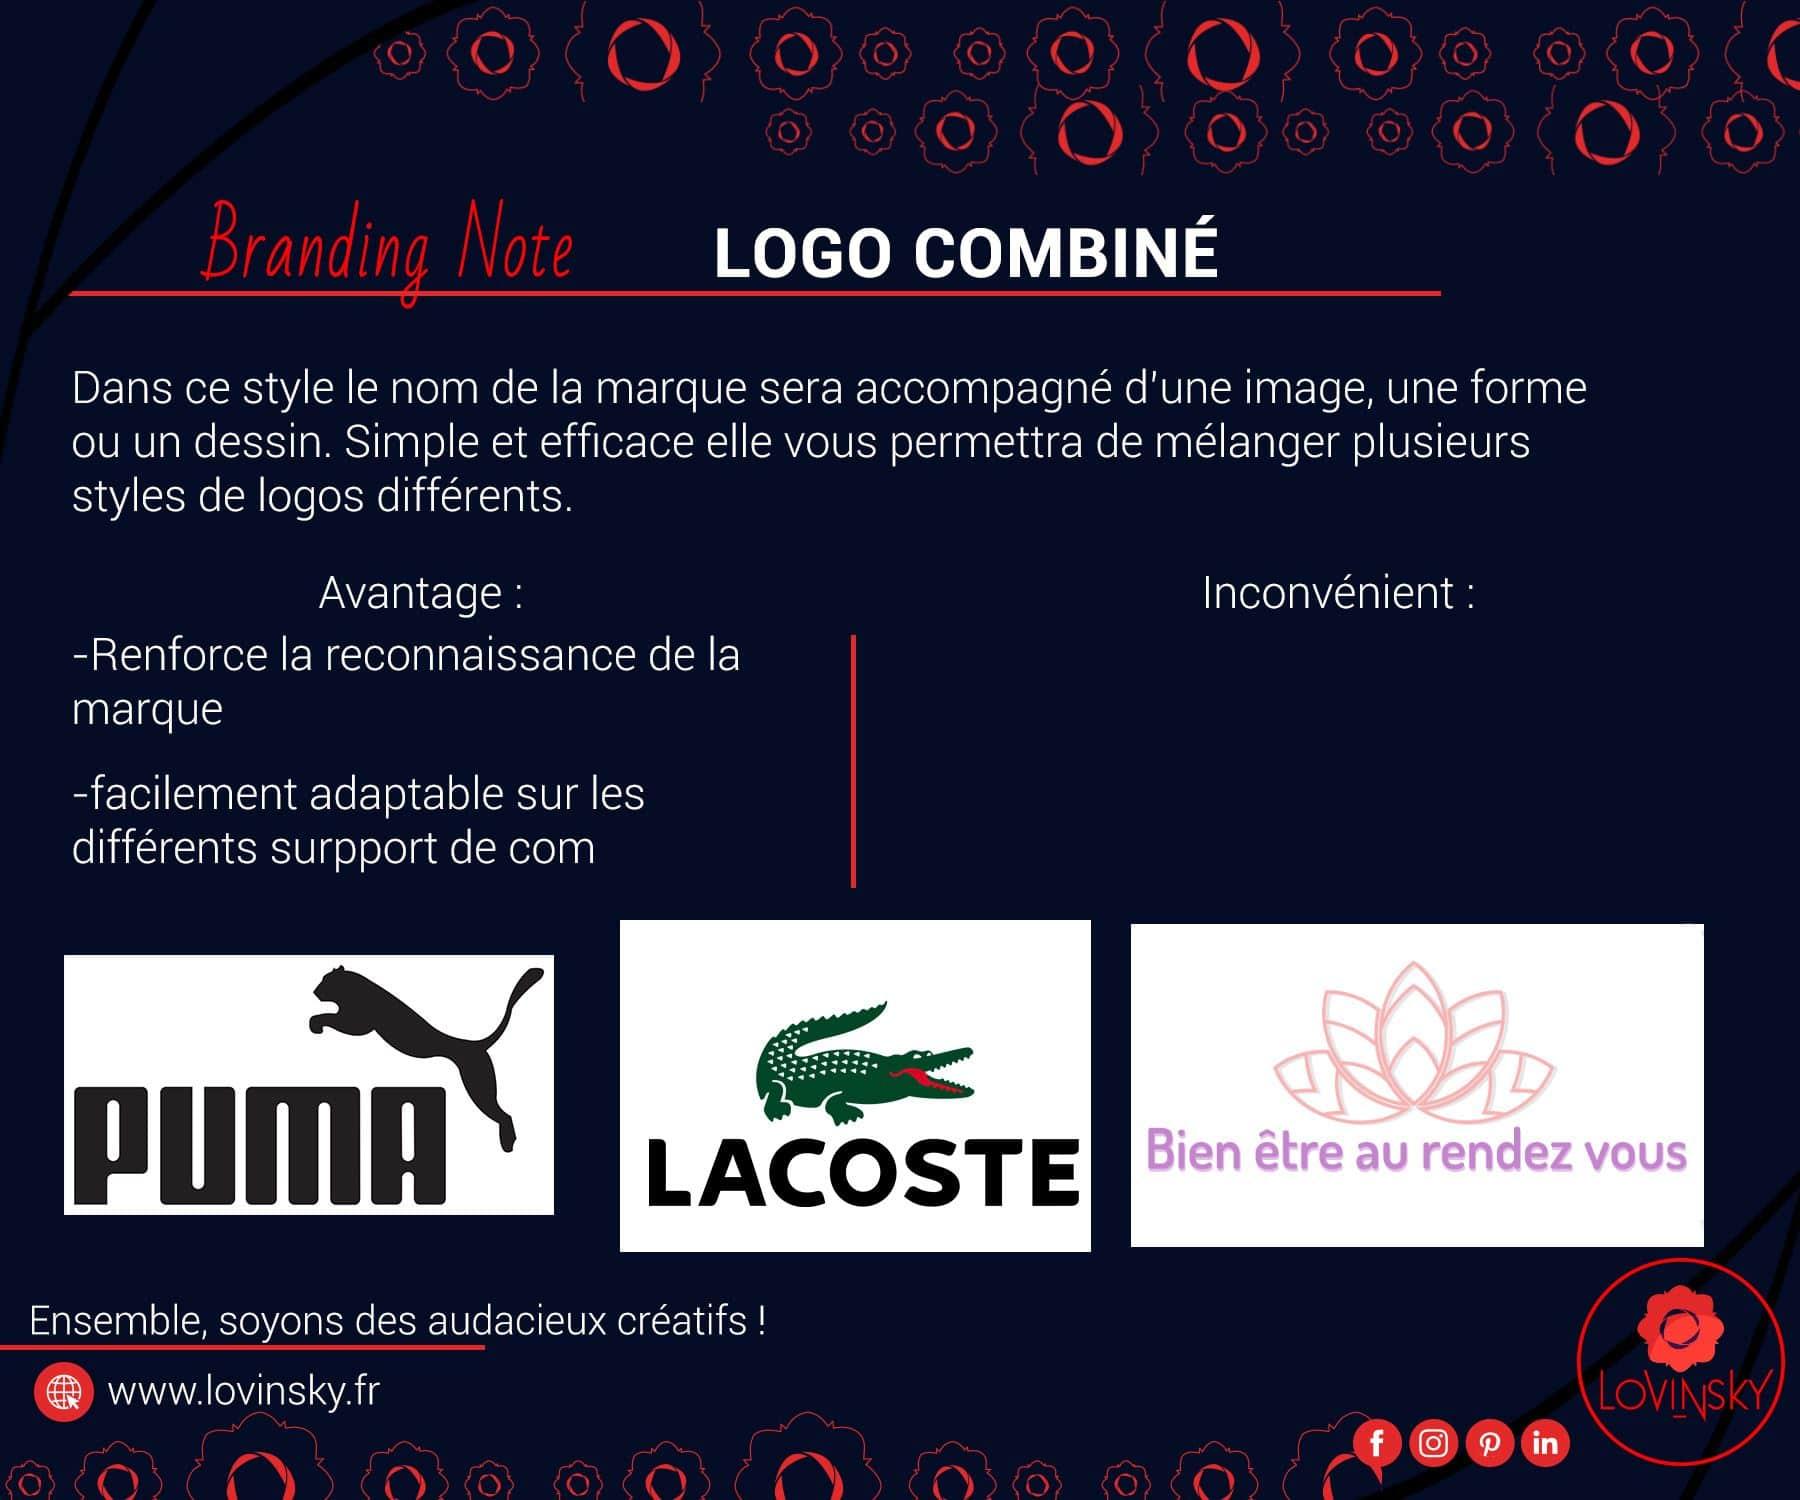 logo-combiné lovinsky graphiste webdesigner freelance indépendant nantes 44